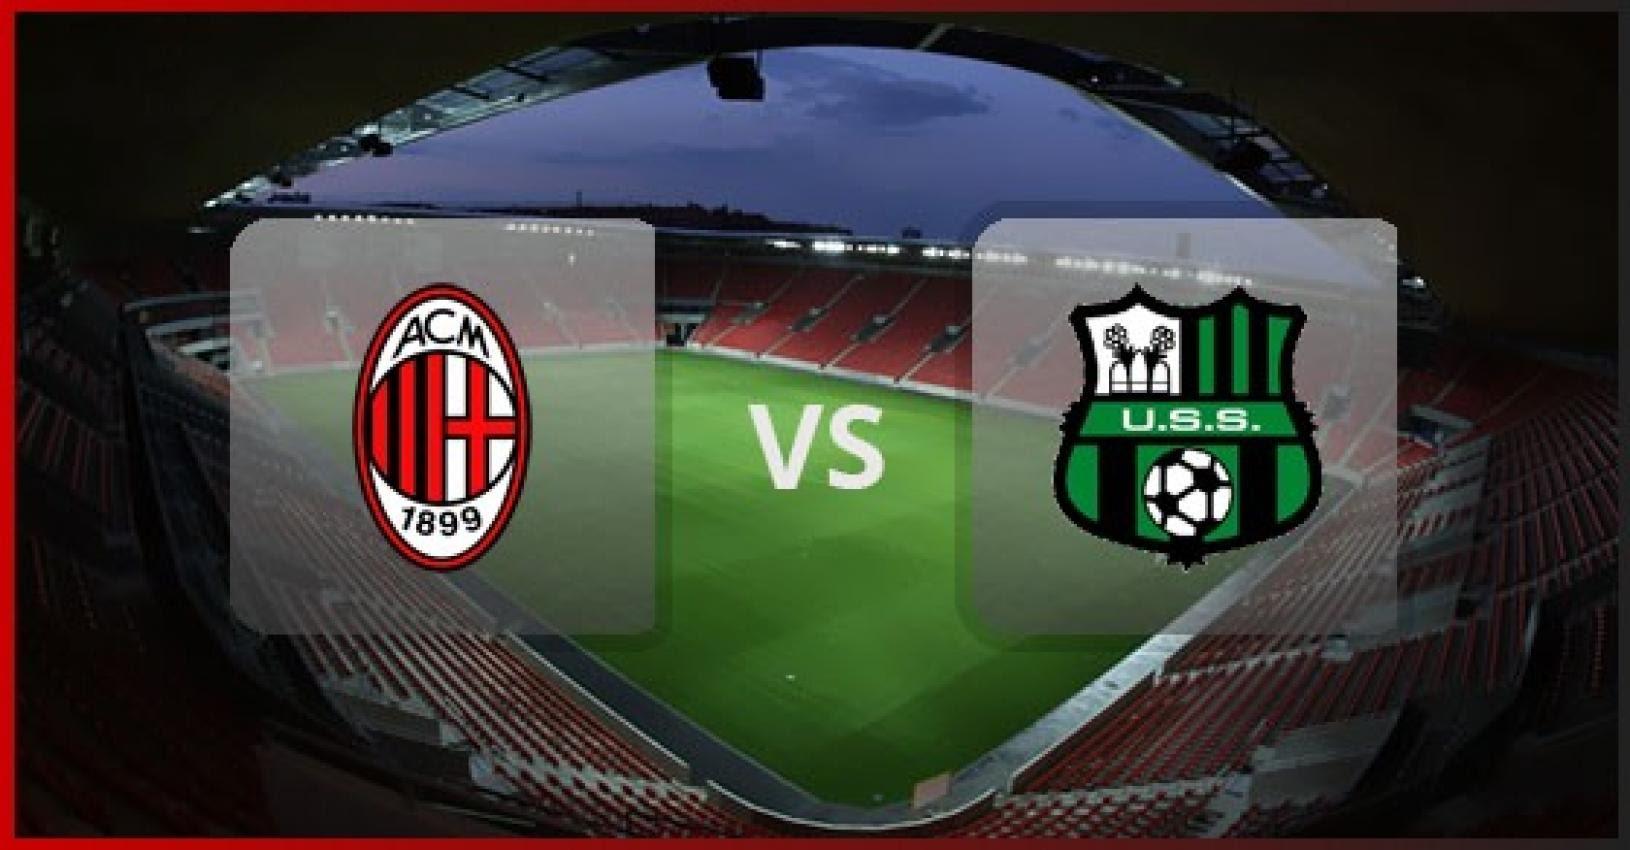 Ponturi fotbal milan sassuolo italia serie a ponturi bune - Sassuolo italia ...